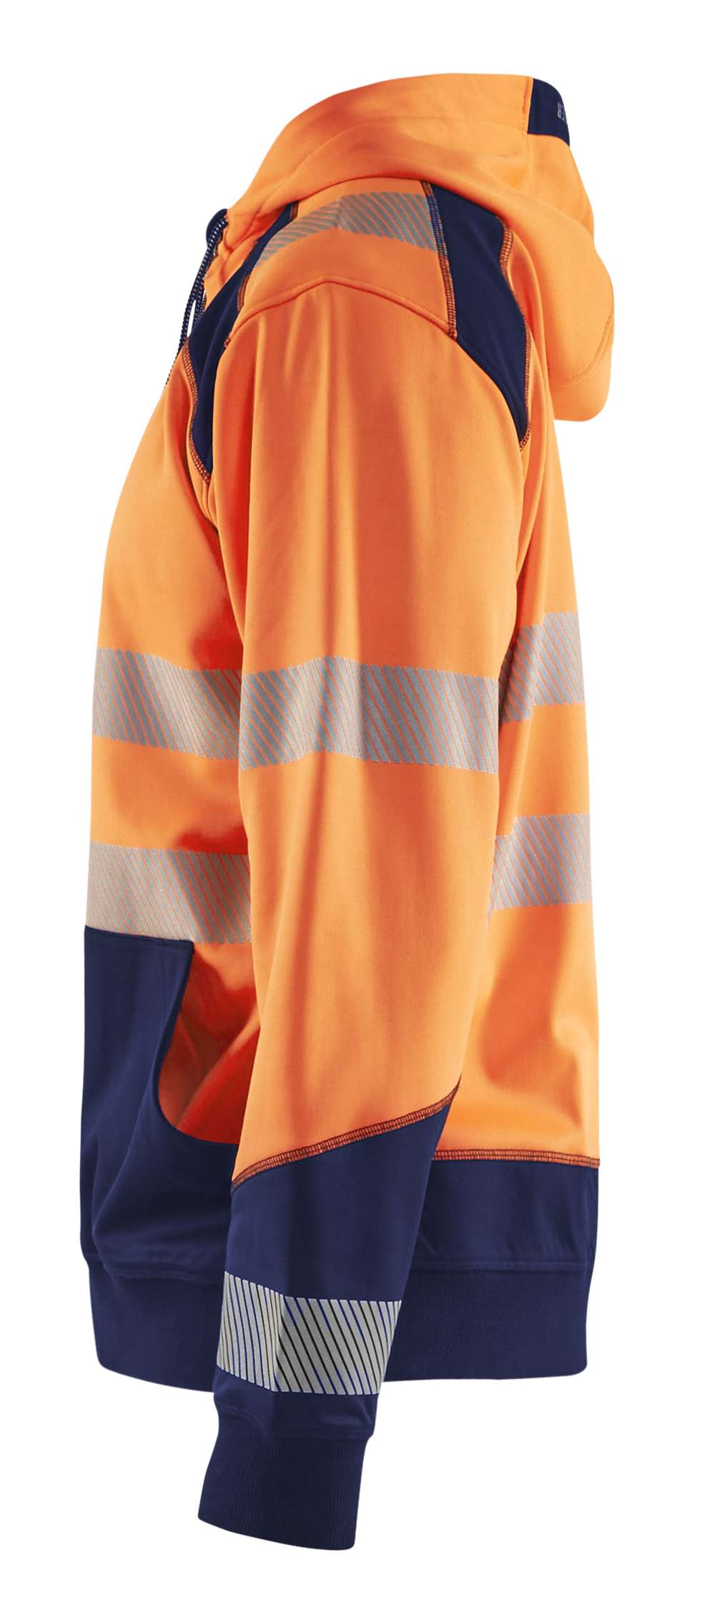 Blaklader Hooded sweatvesten 35462528 High Vis fluo oranje-marineblauw(5389)